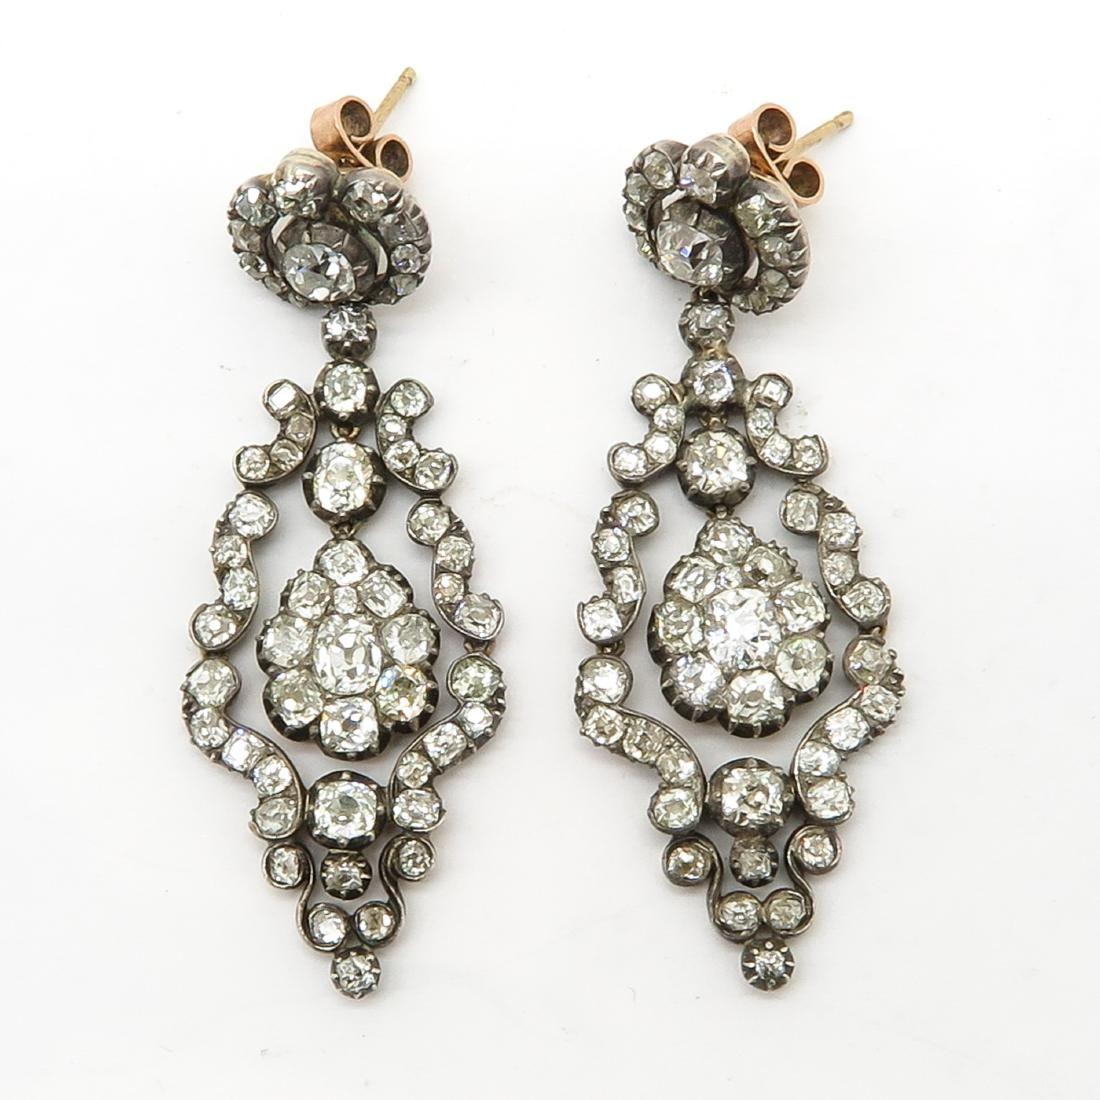 A Beautiful Pair of Diamond Victorian Earrings